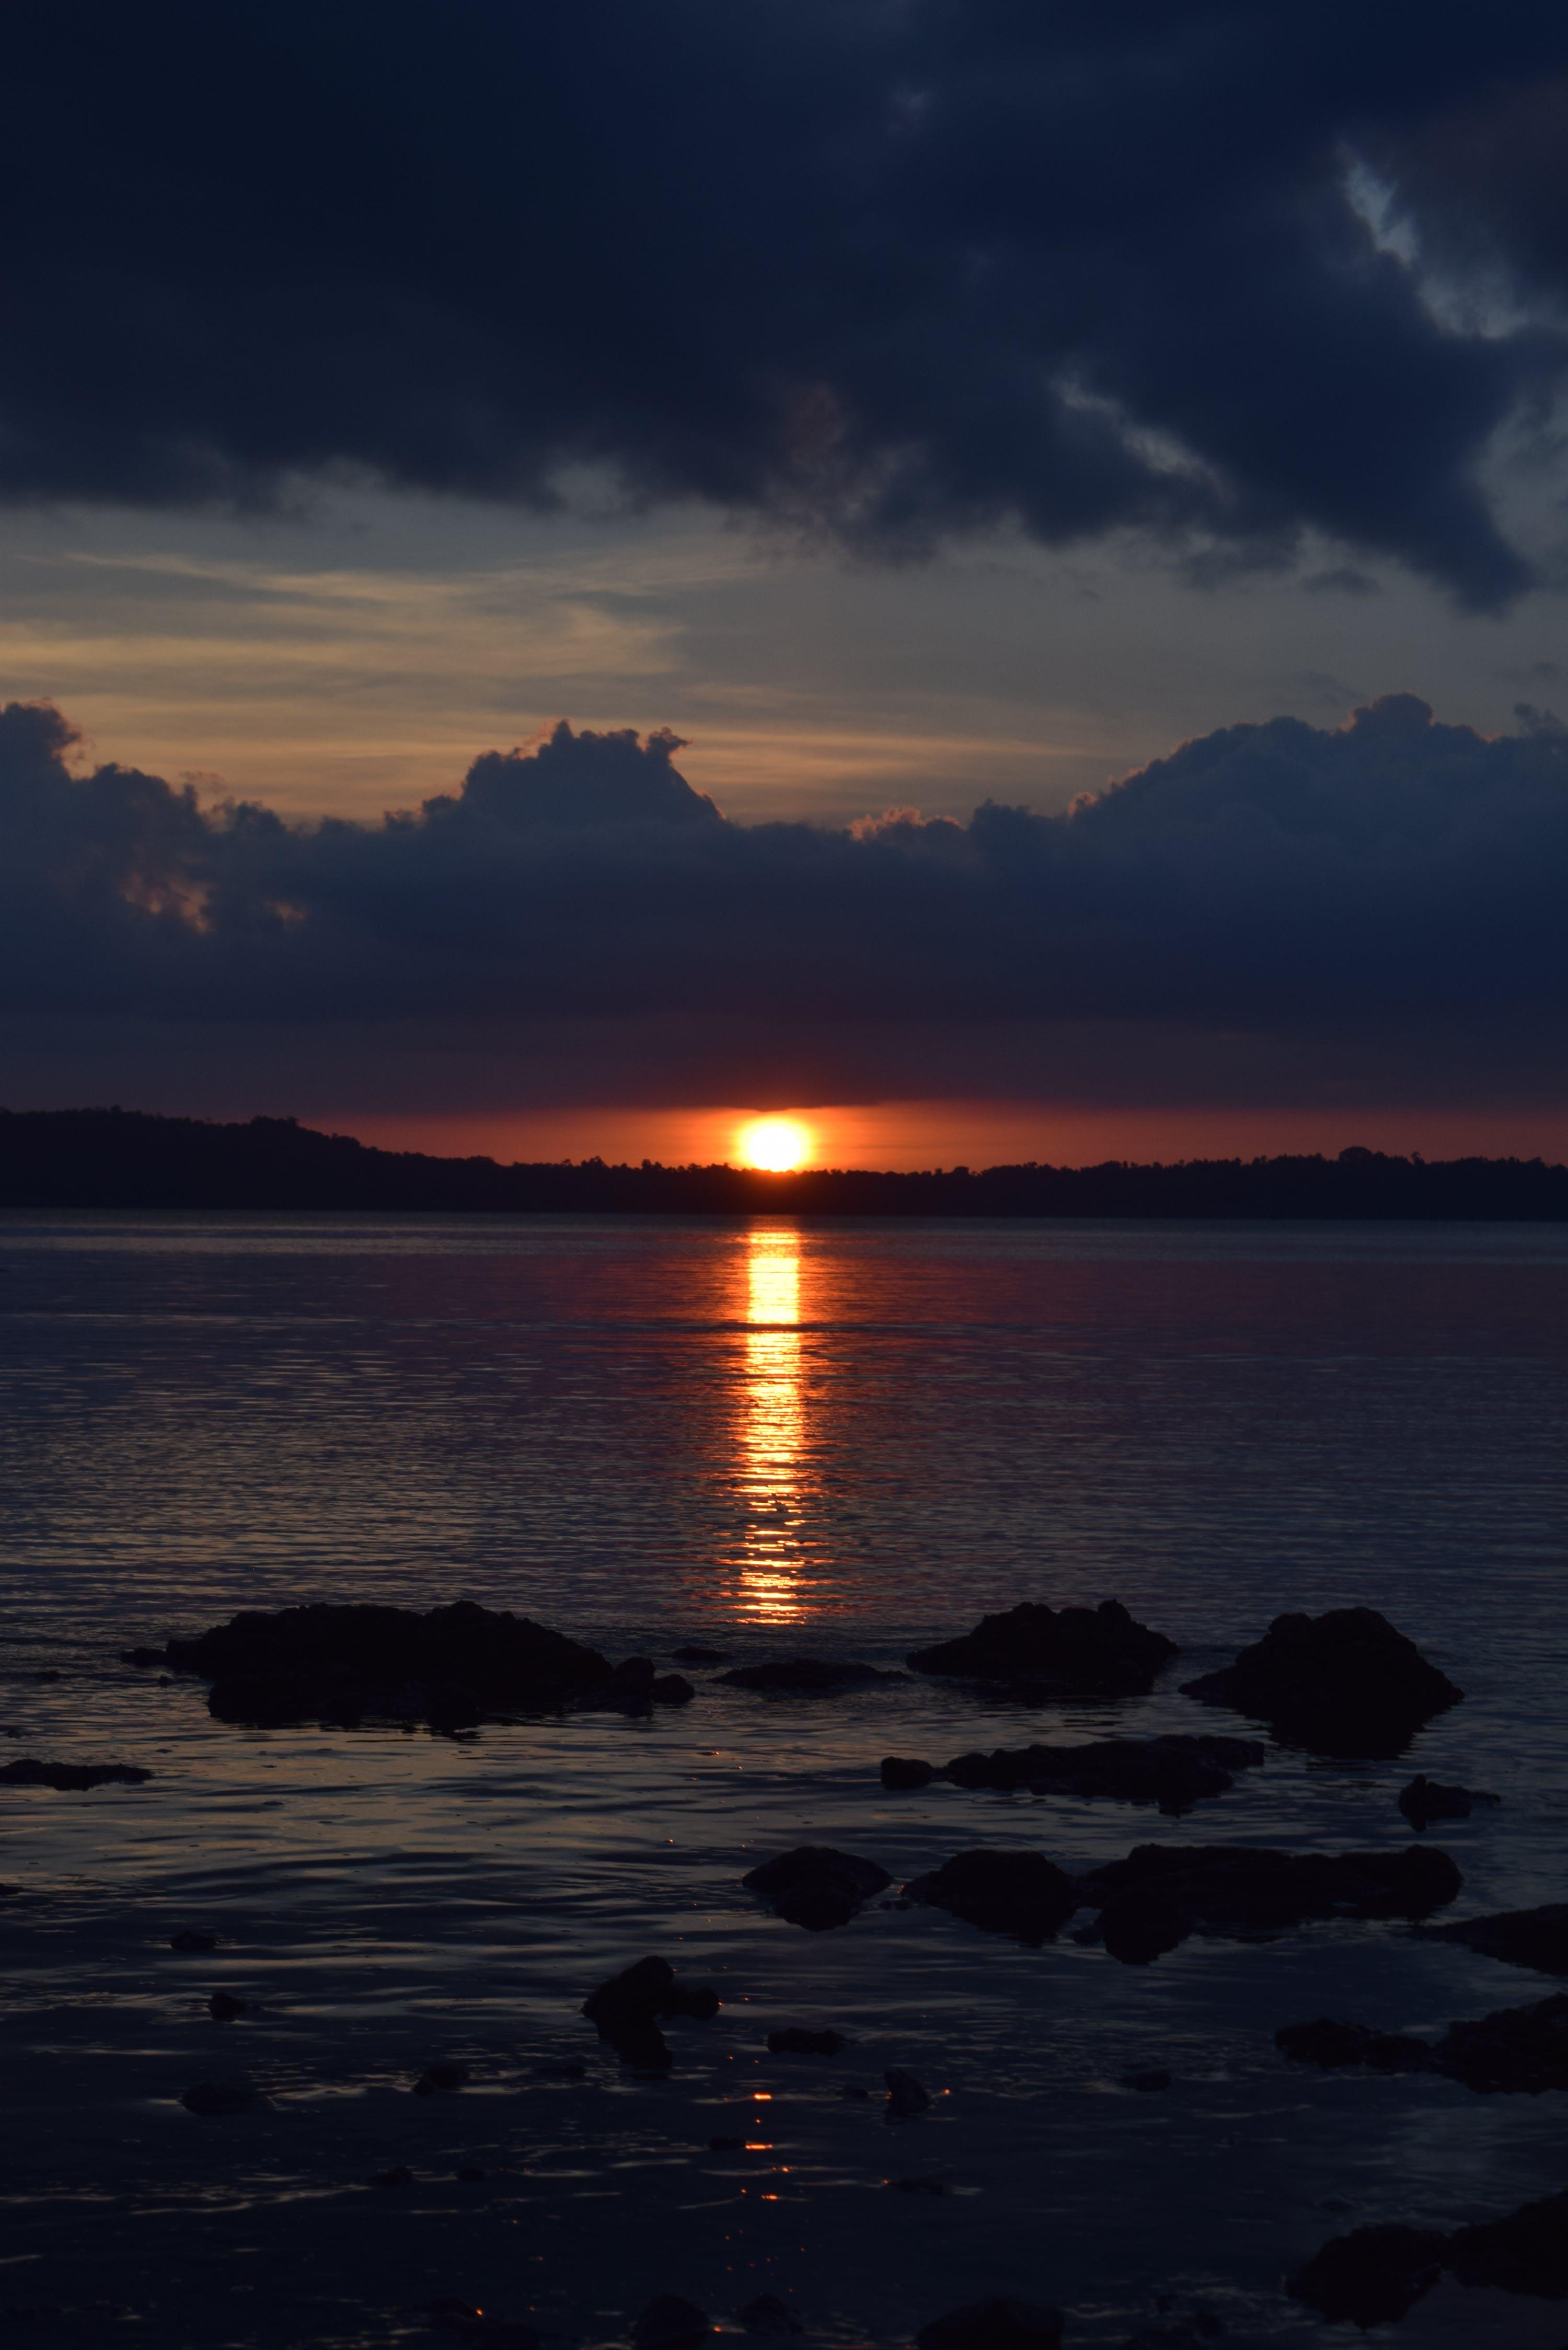 Free stock photo of clouds, daylight, deep sea, evening sun